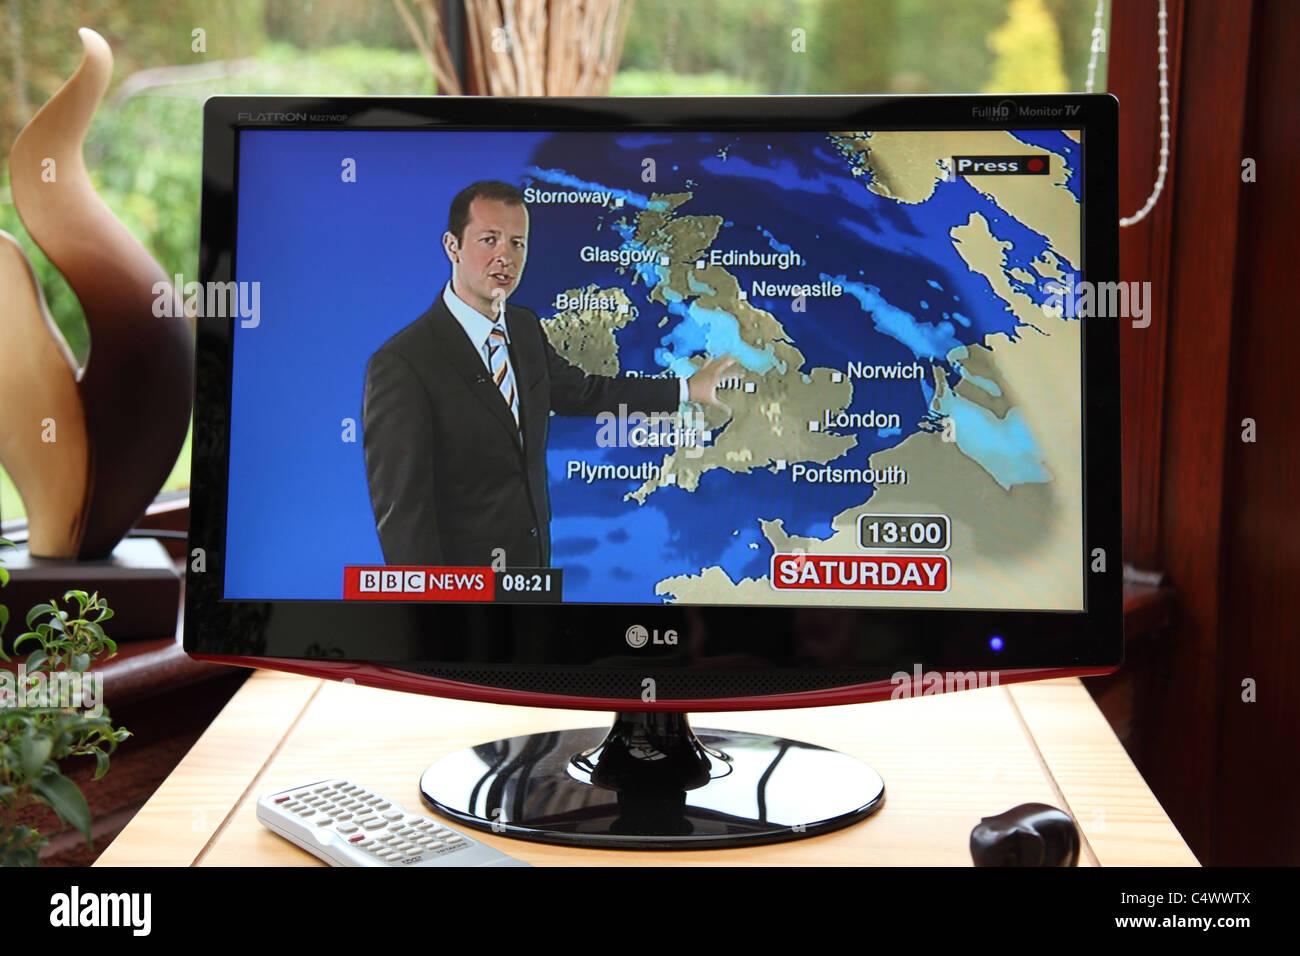 The BBC weather forecast. - Stock Image